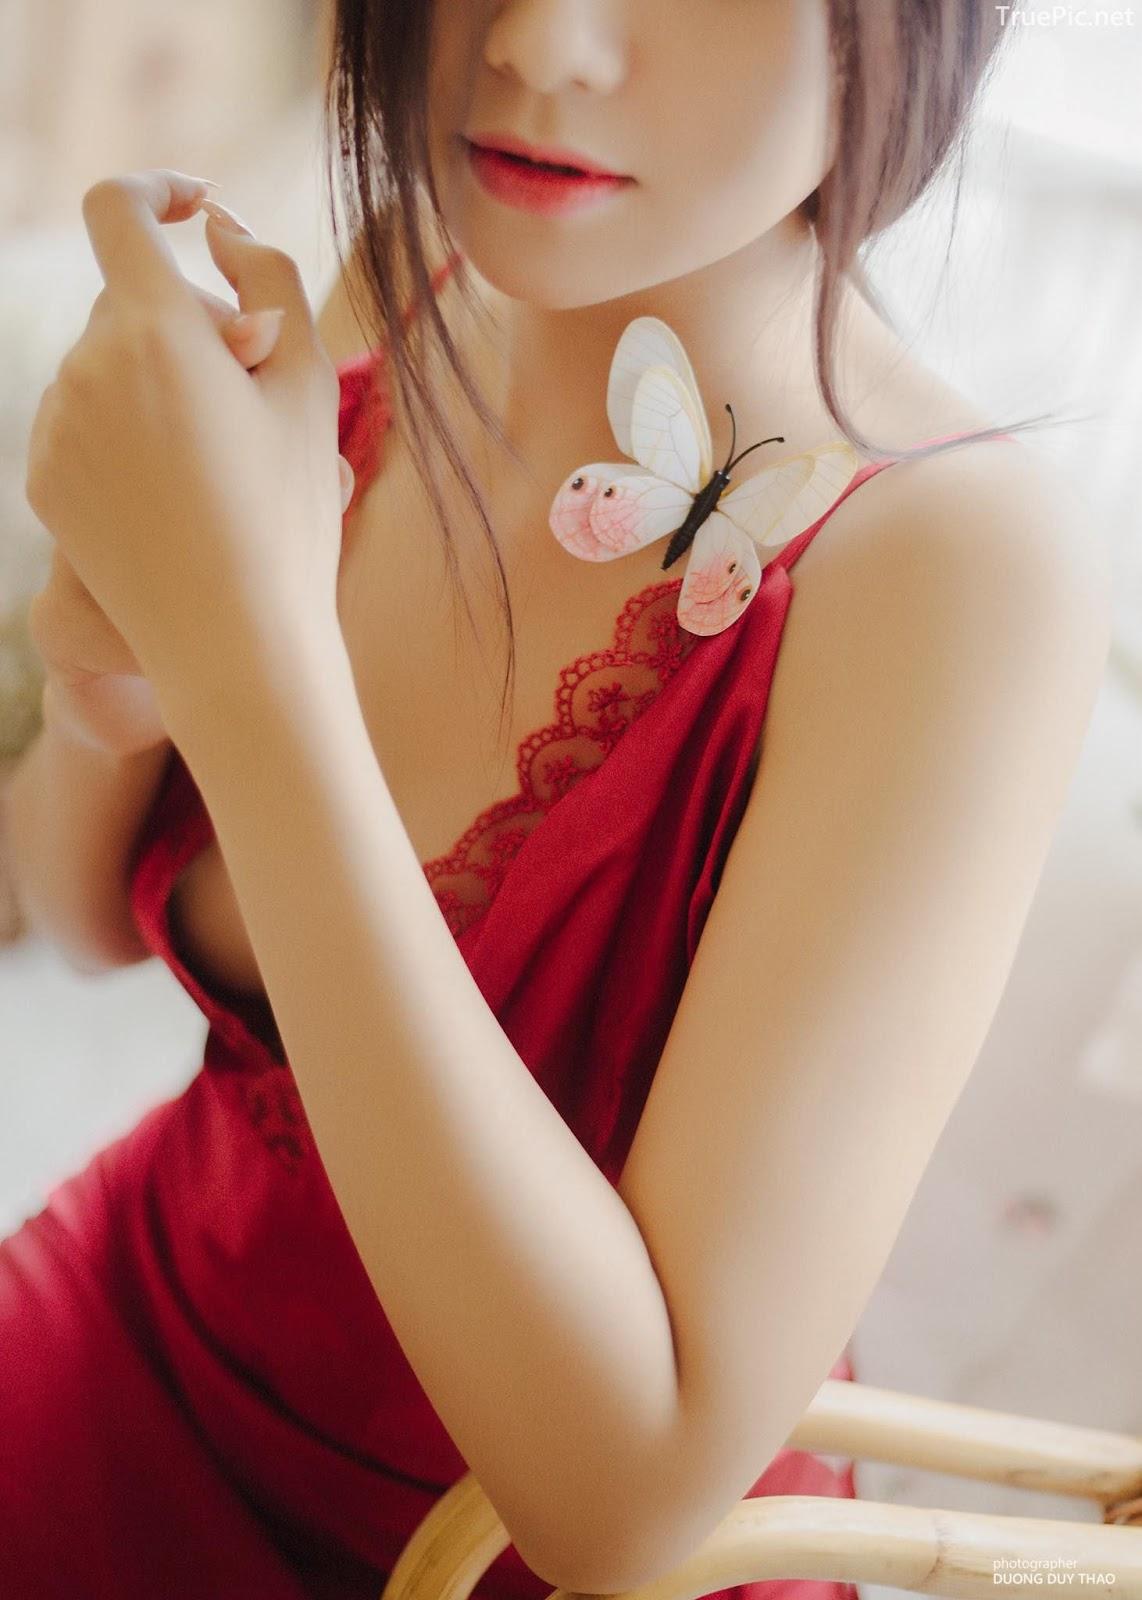 Vietnamese hot girl model Hua Thao Nguyen - She is a beautiful butterfly - Picture 8